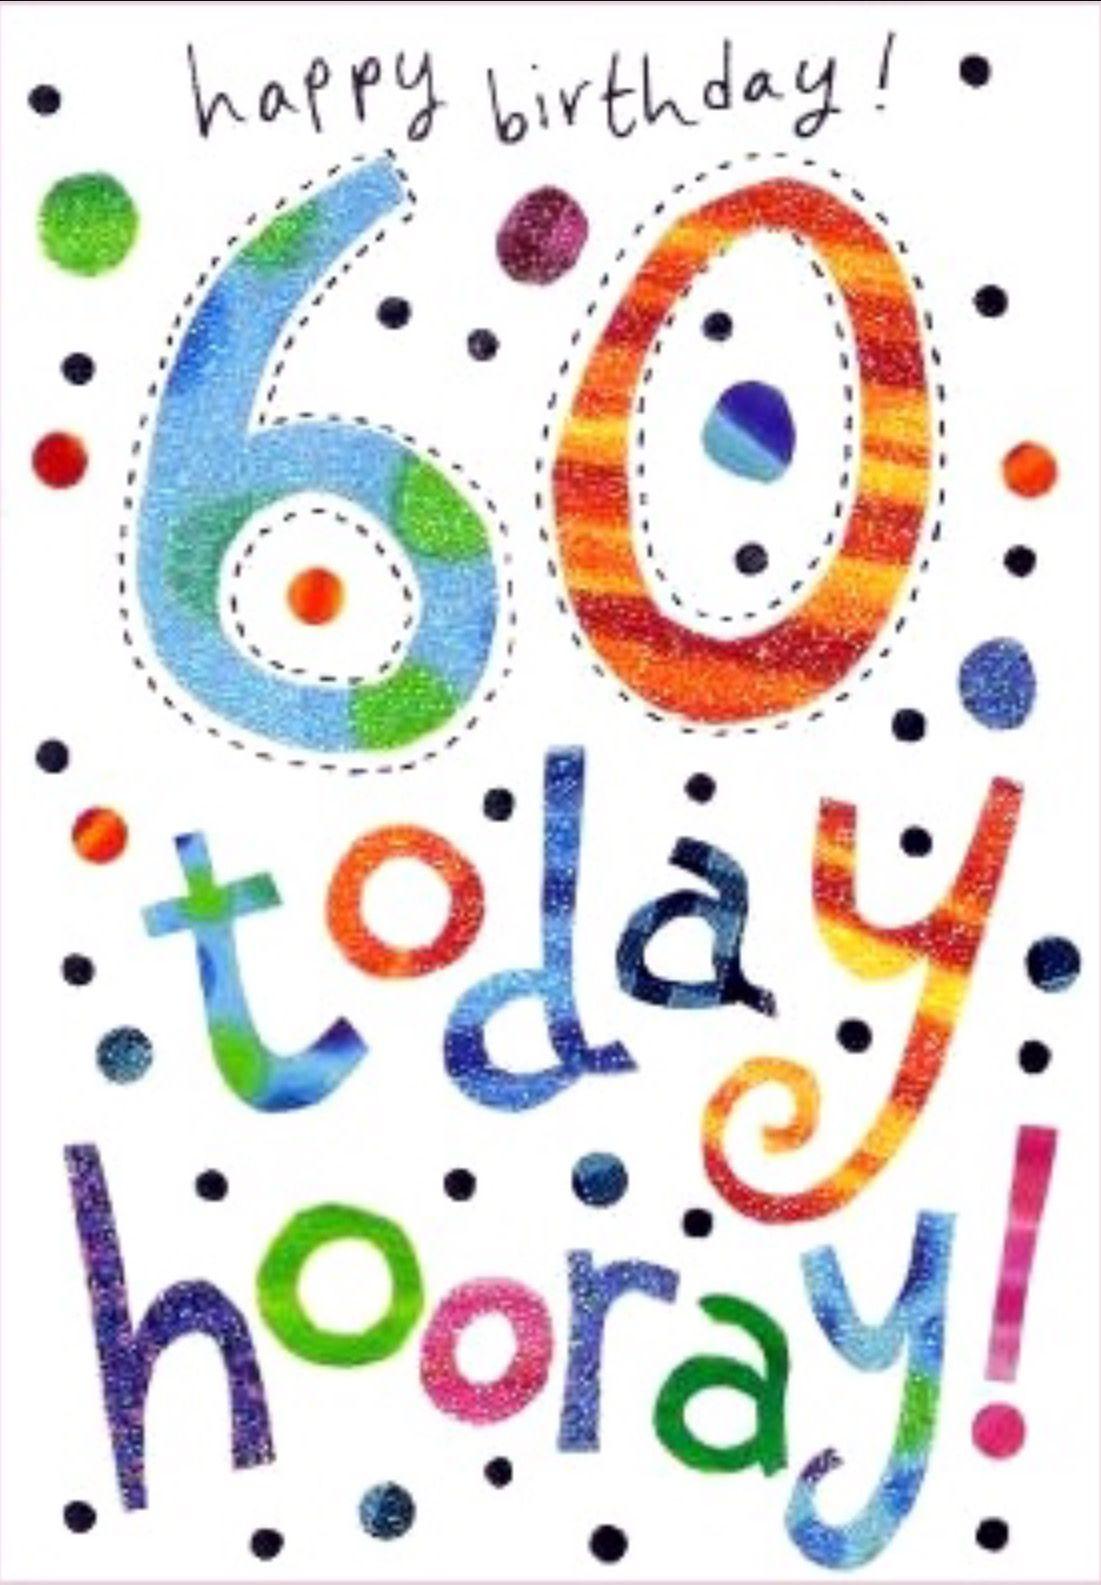 60th Birthday Clipart : birthday, clipart, Beverly, Pacala, Birthday, Cards, Cards,, Happy, Birthday,